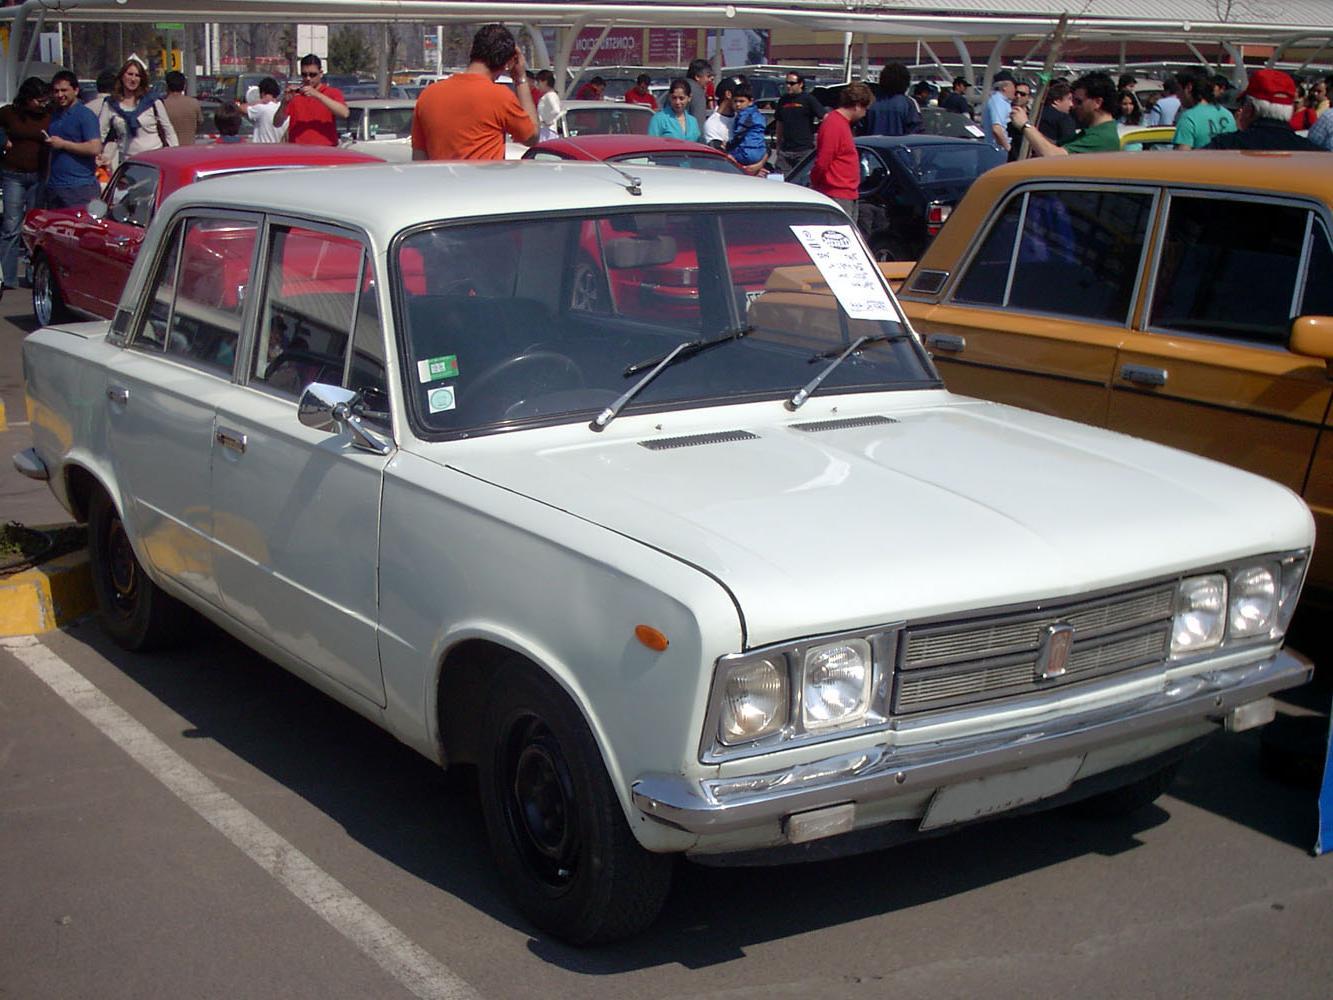 Fiat 125 Special 1600     Chile. Cesko-Slovensk   motoristick   datab  ze